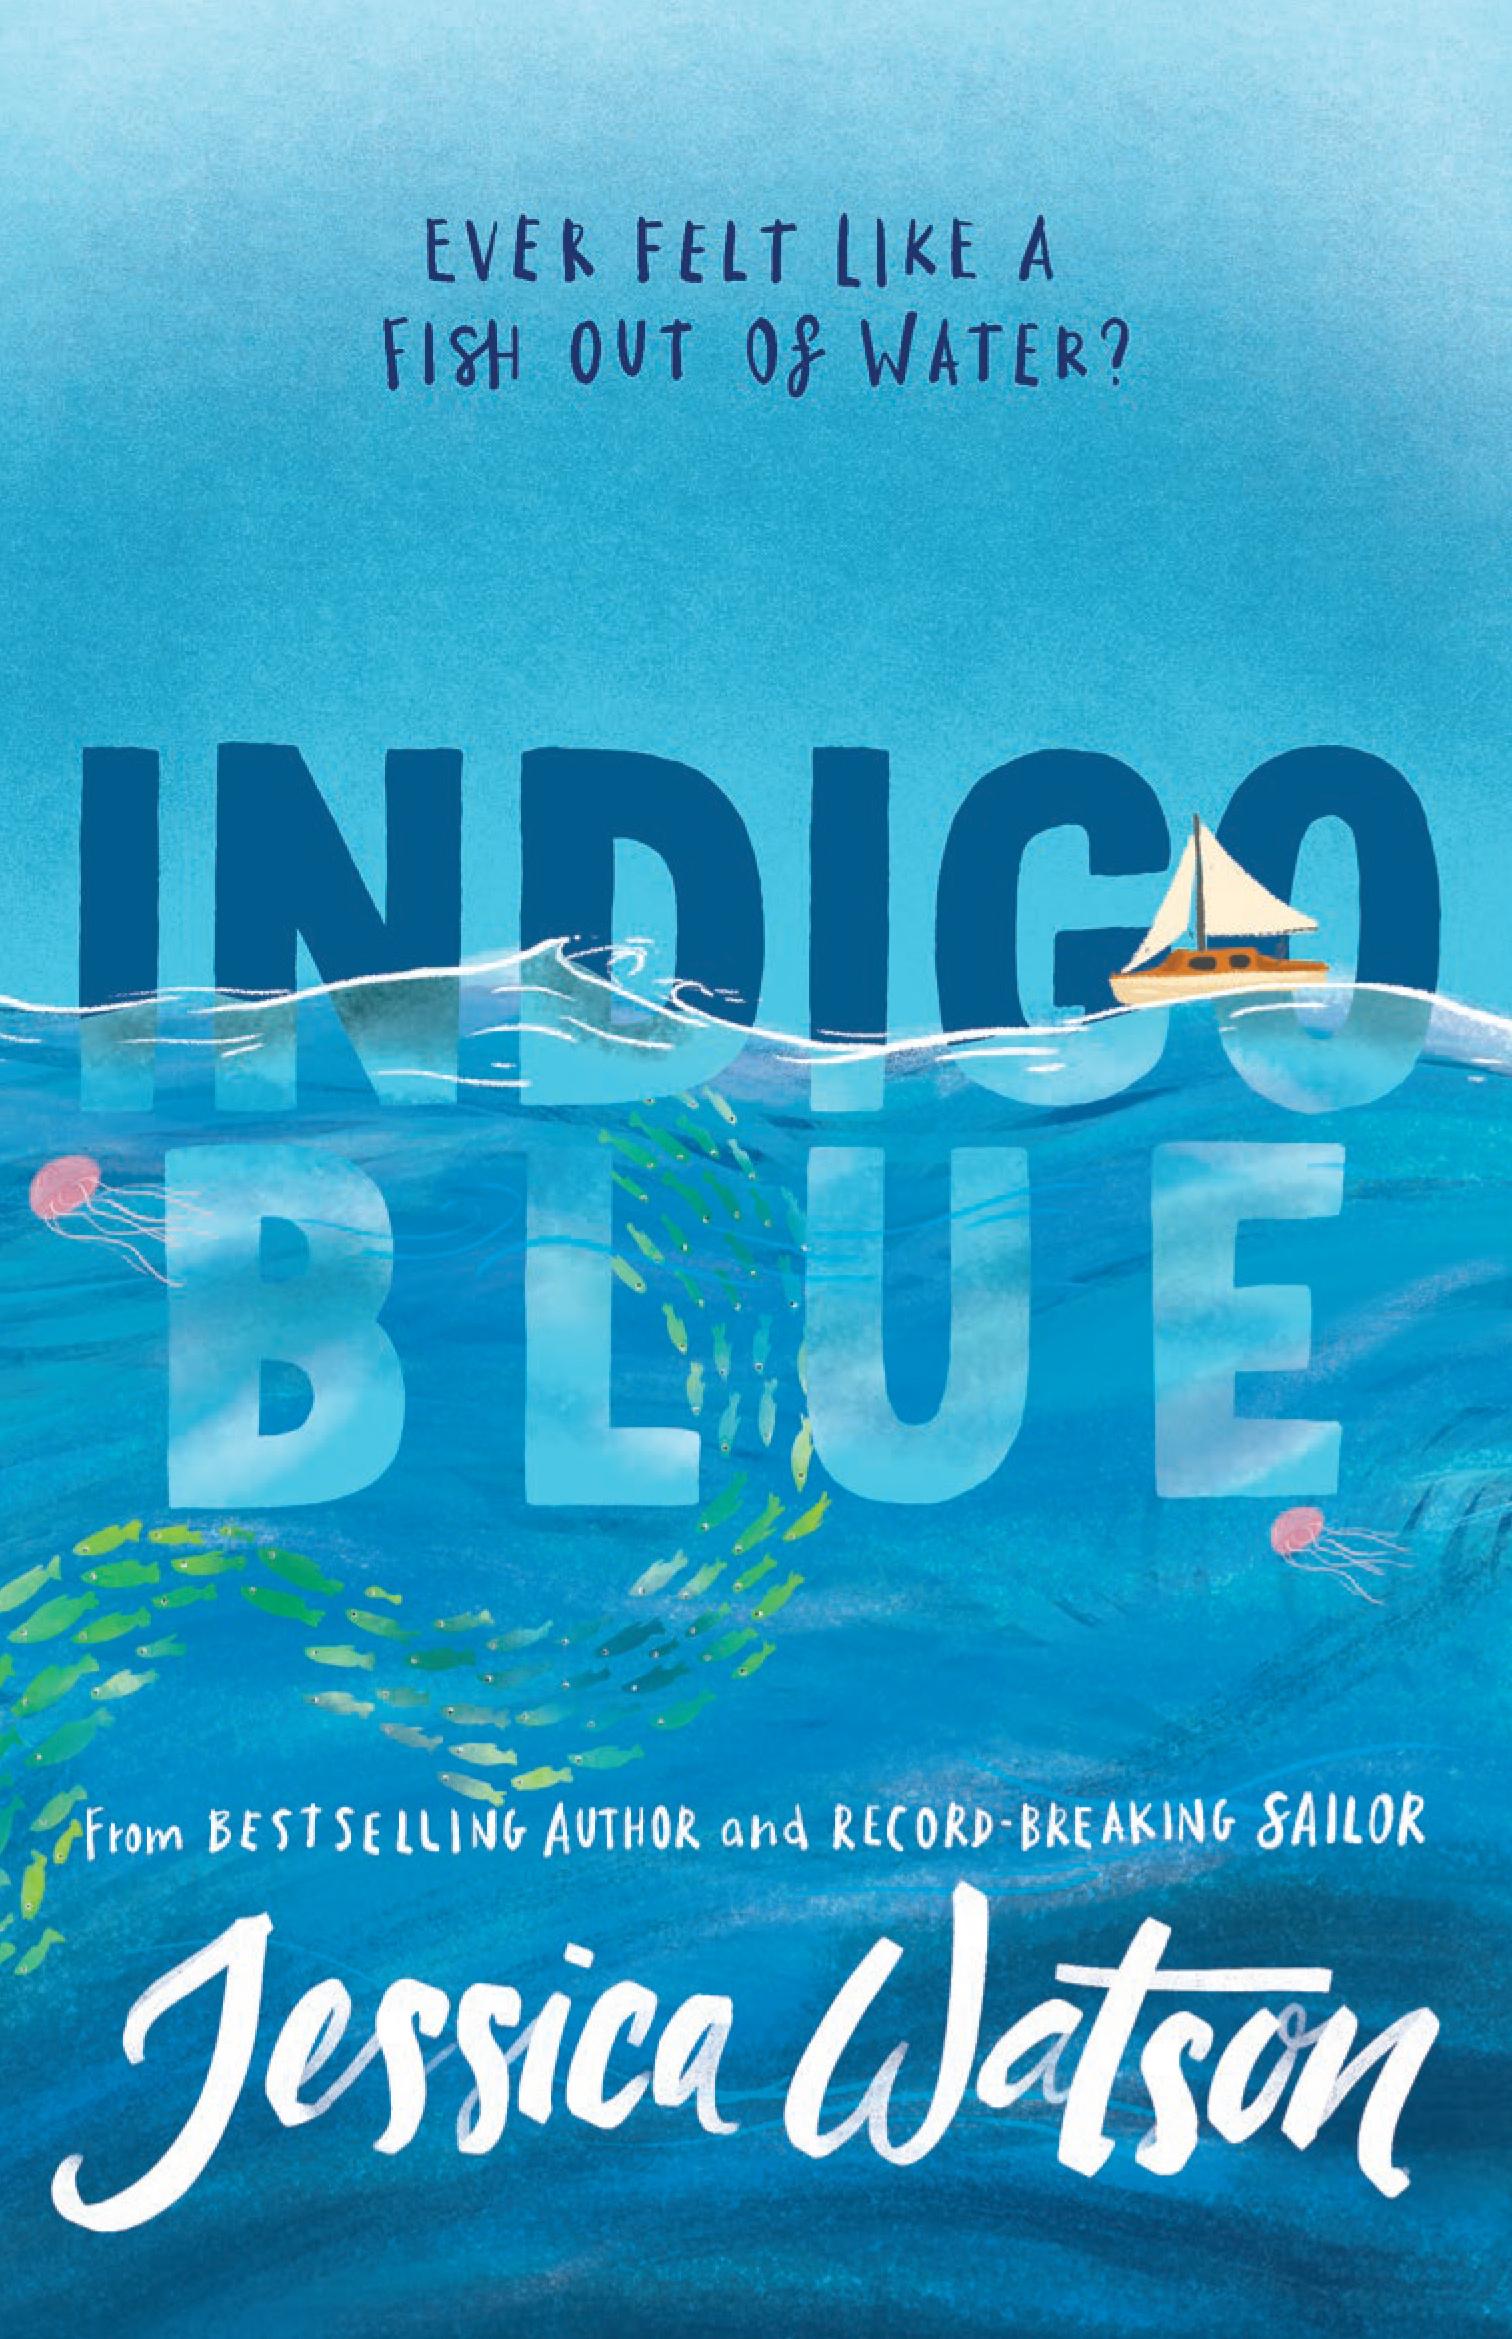 Blue Covered Book : Indigo blue by jessica watson books hachette australia